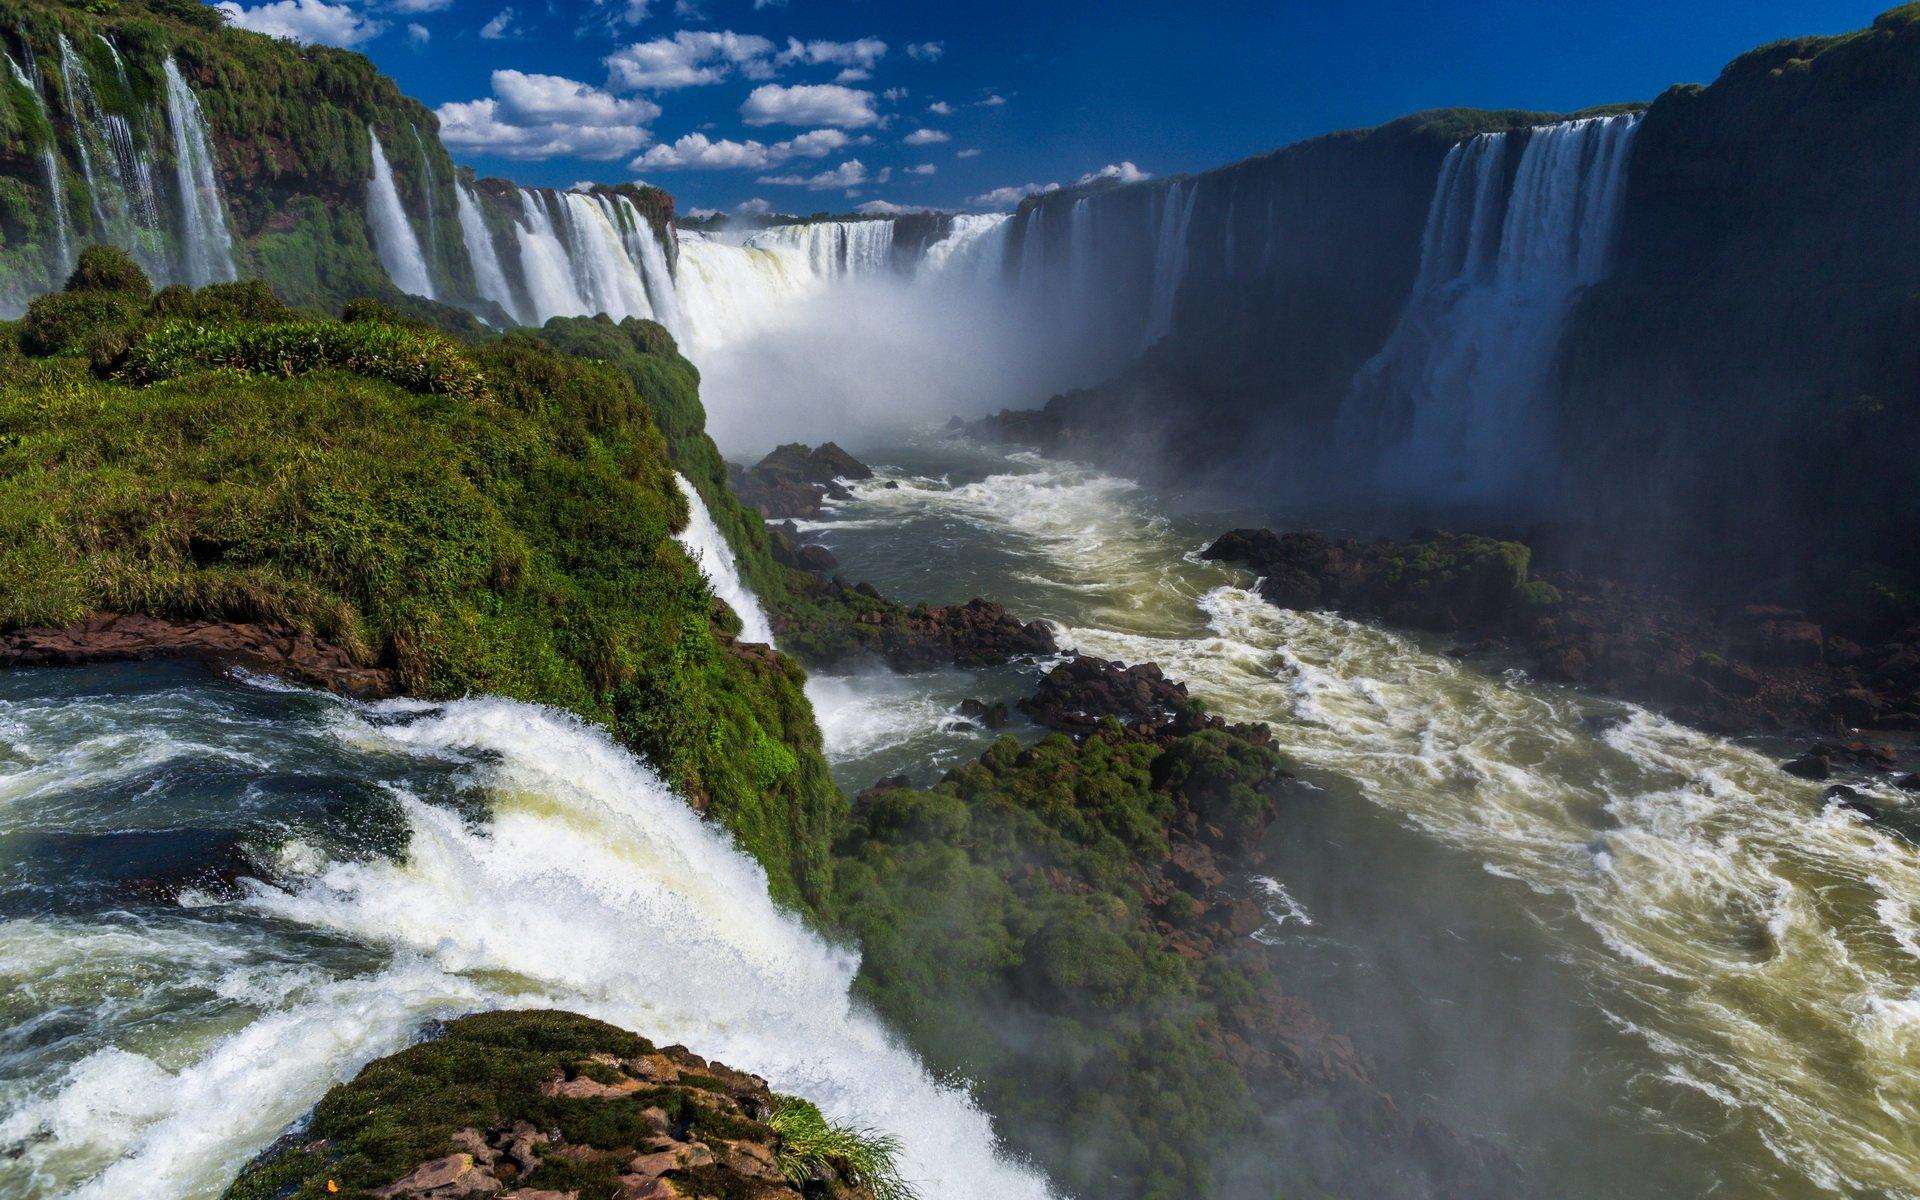 Iguazu Falls Iphone Wallpaper Iguazu Falls Full Hd Wallpaper And Background Image